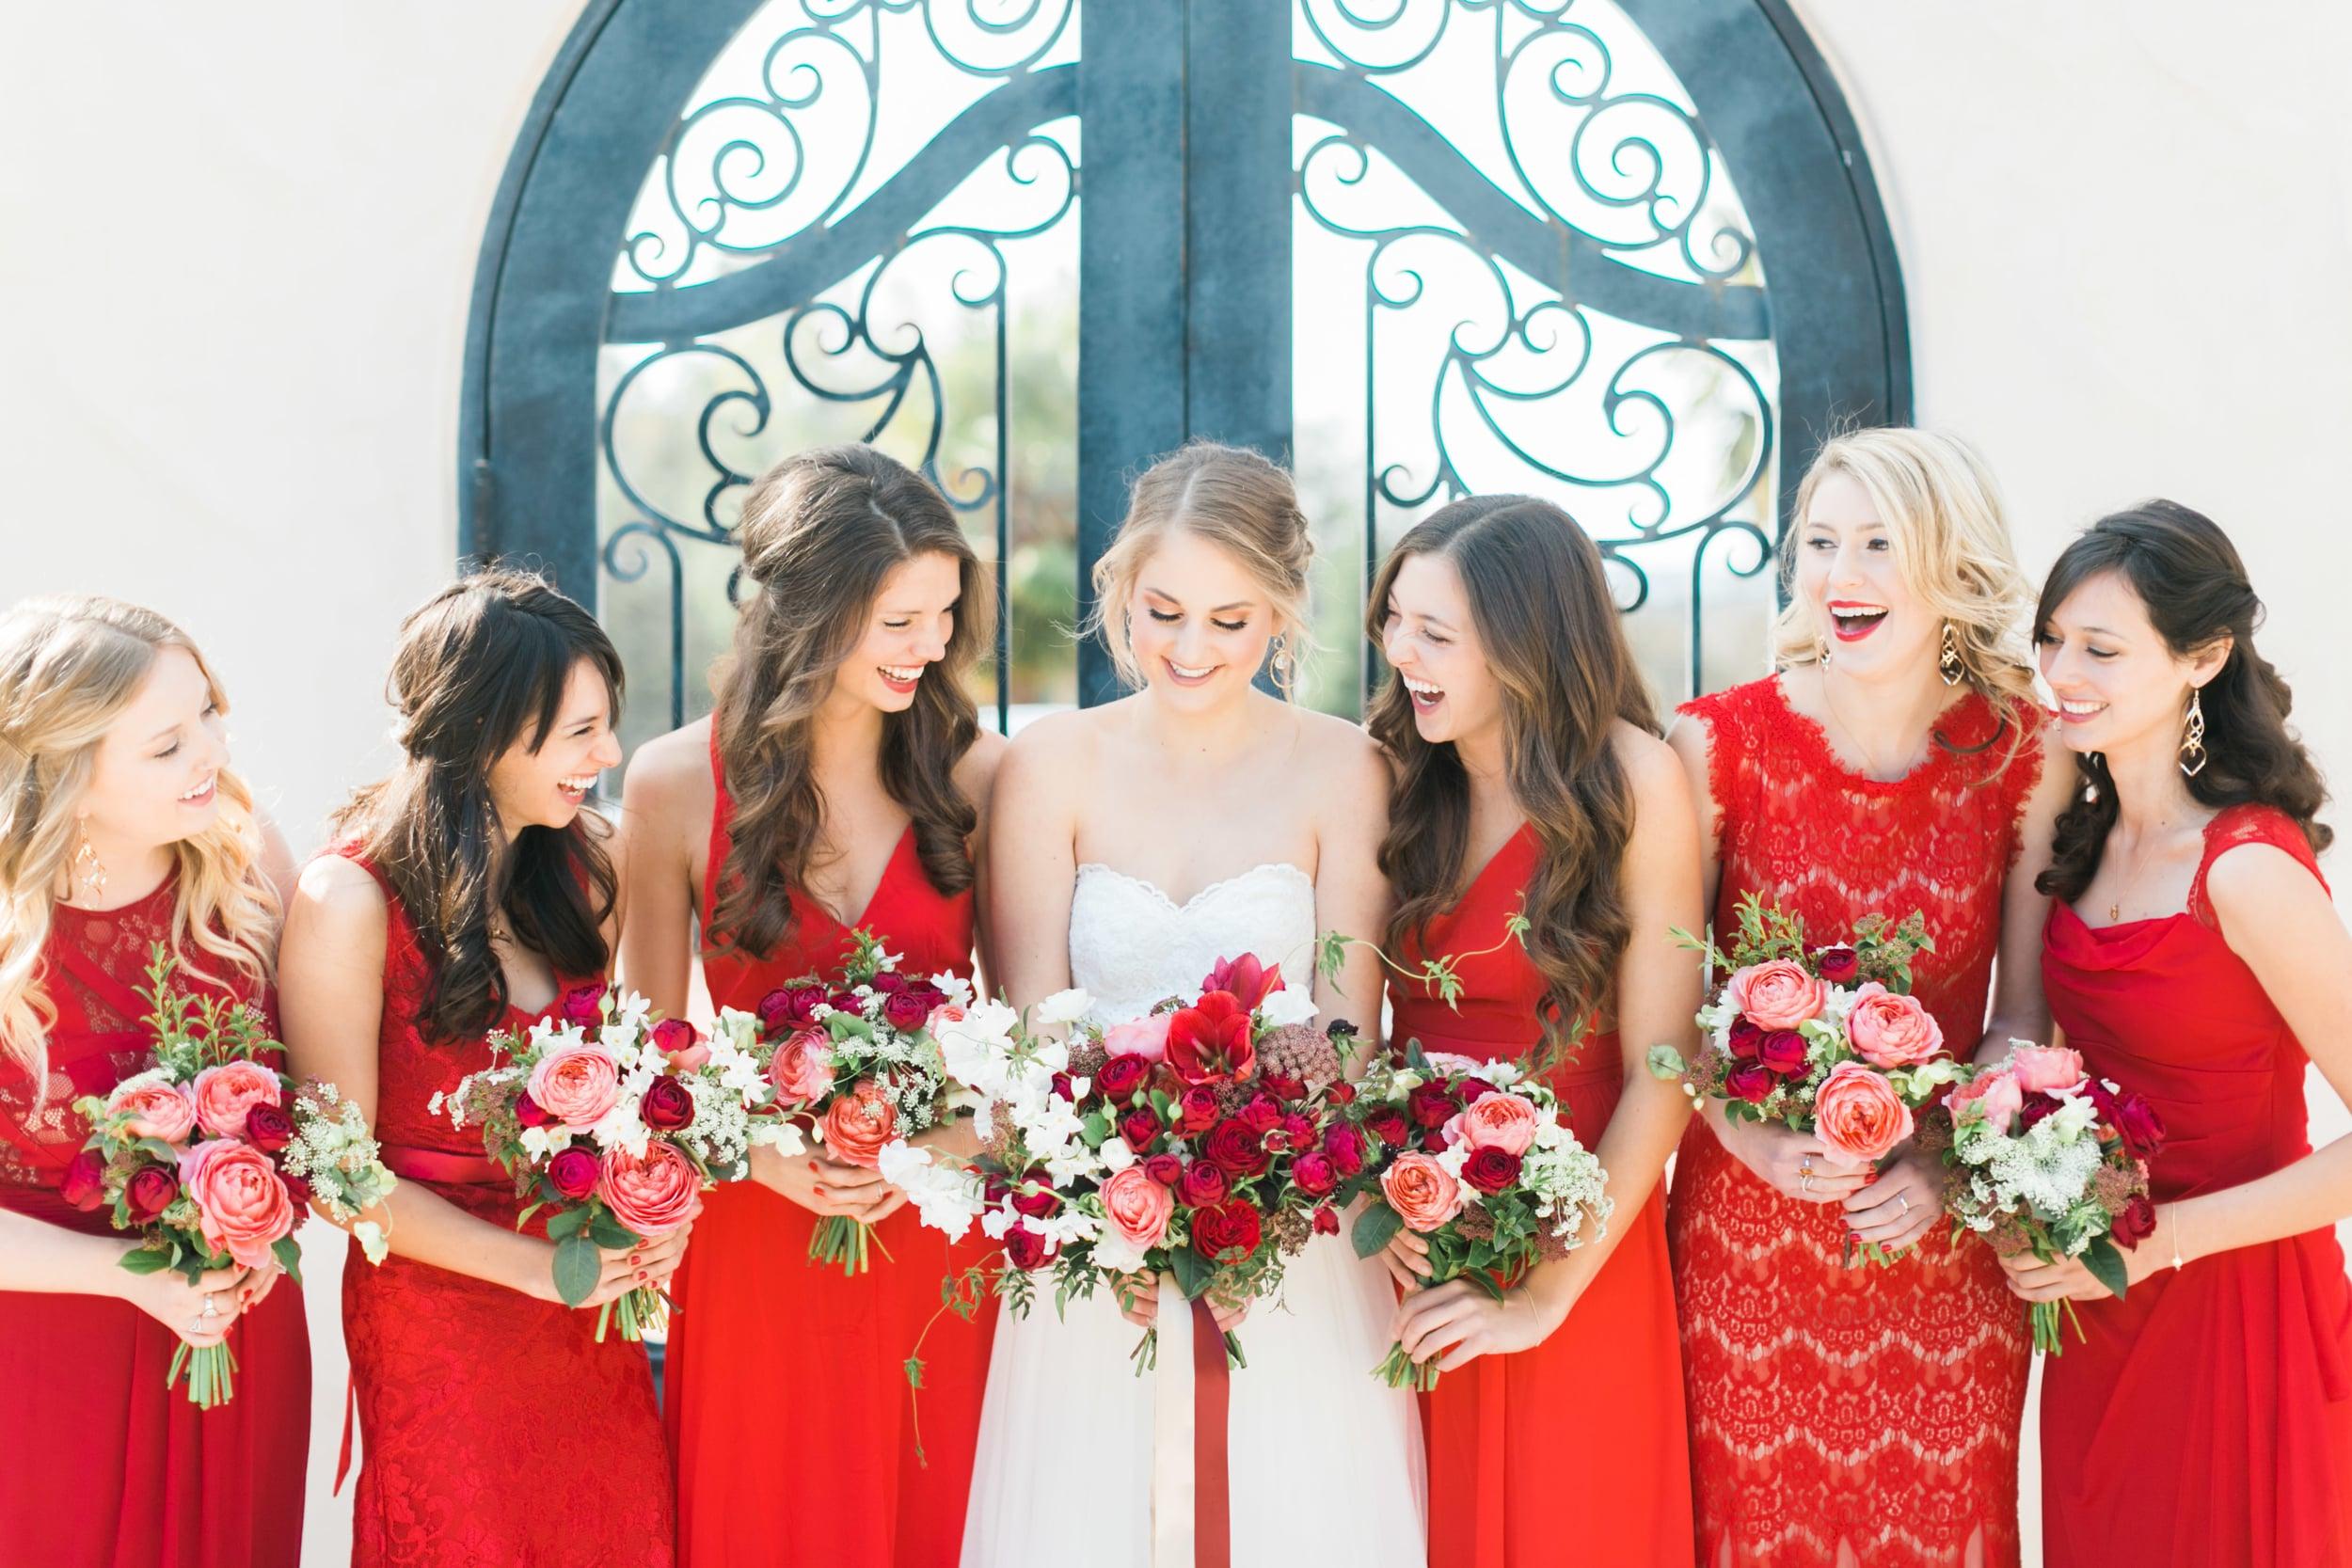 Natalie_Schutt_Photography_Winter_Wedding_San_Luis_Obispo-47.jpg